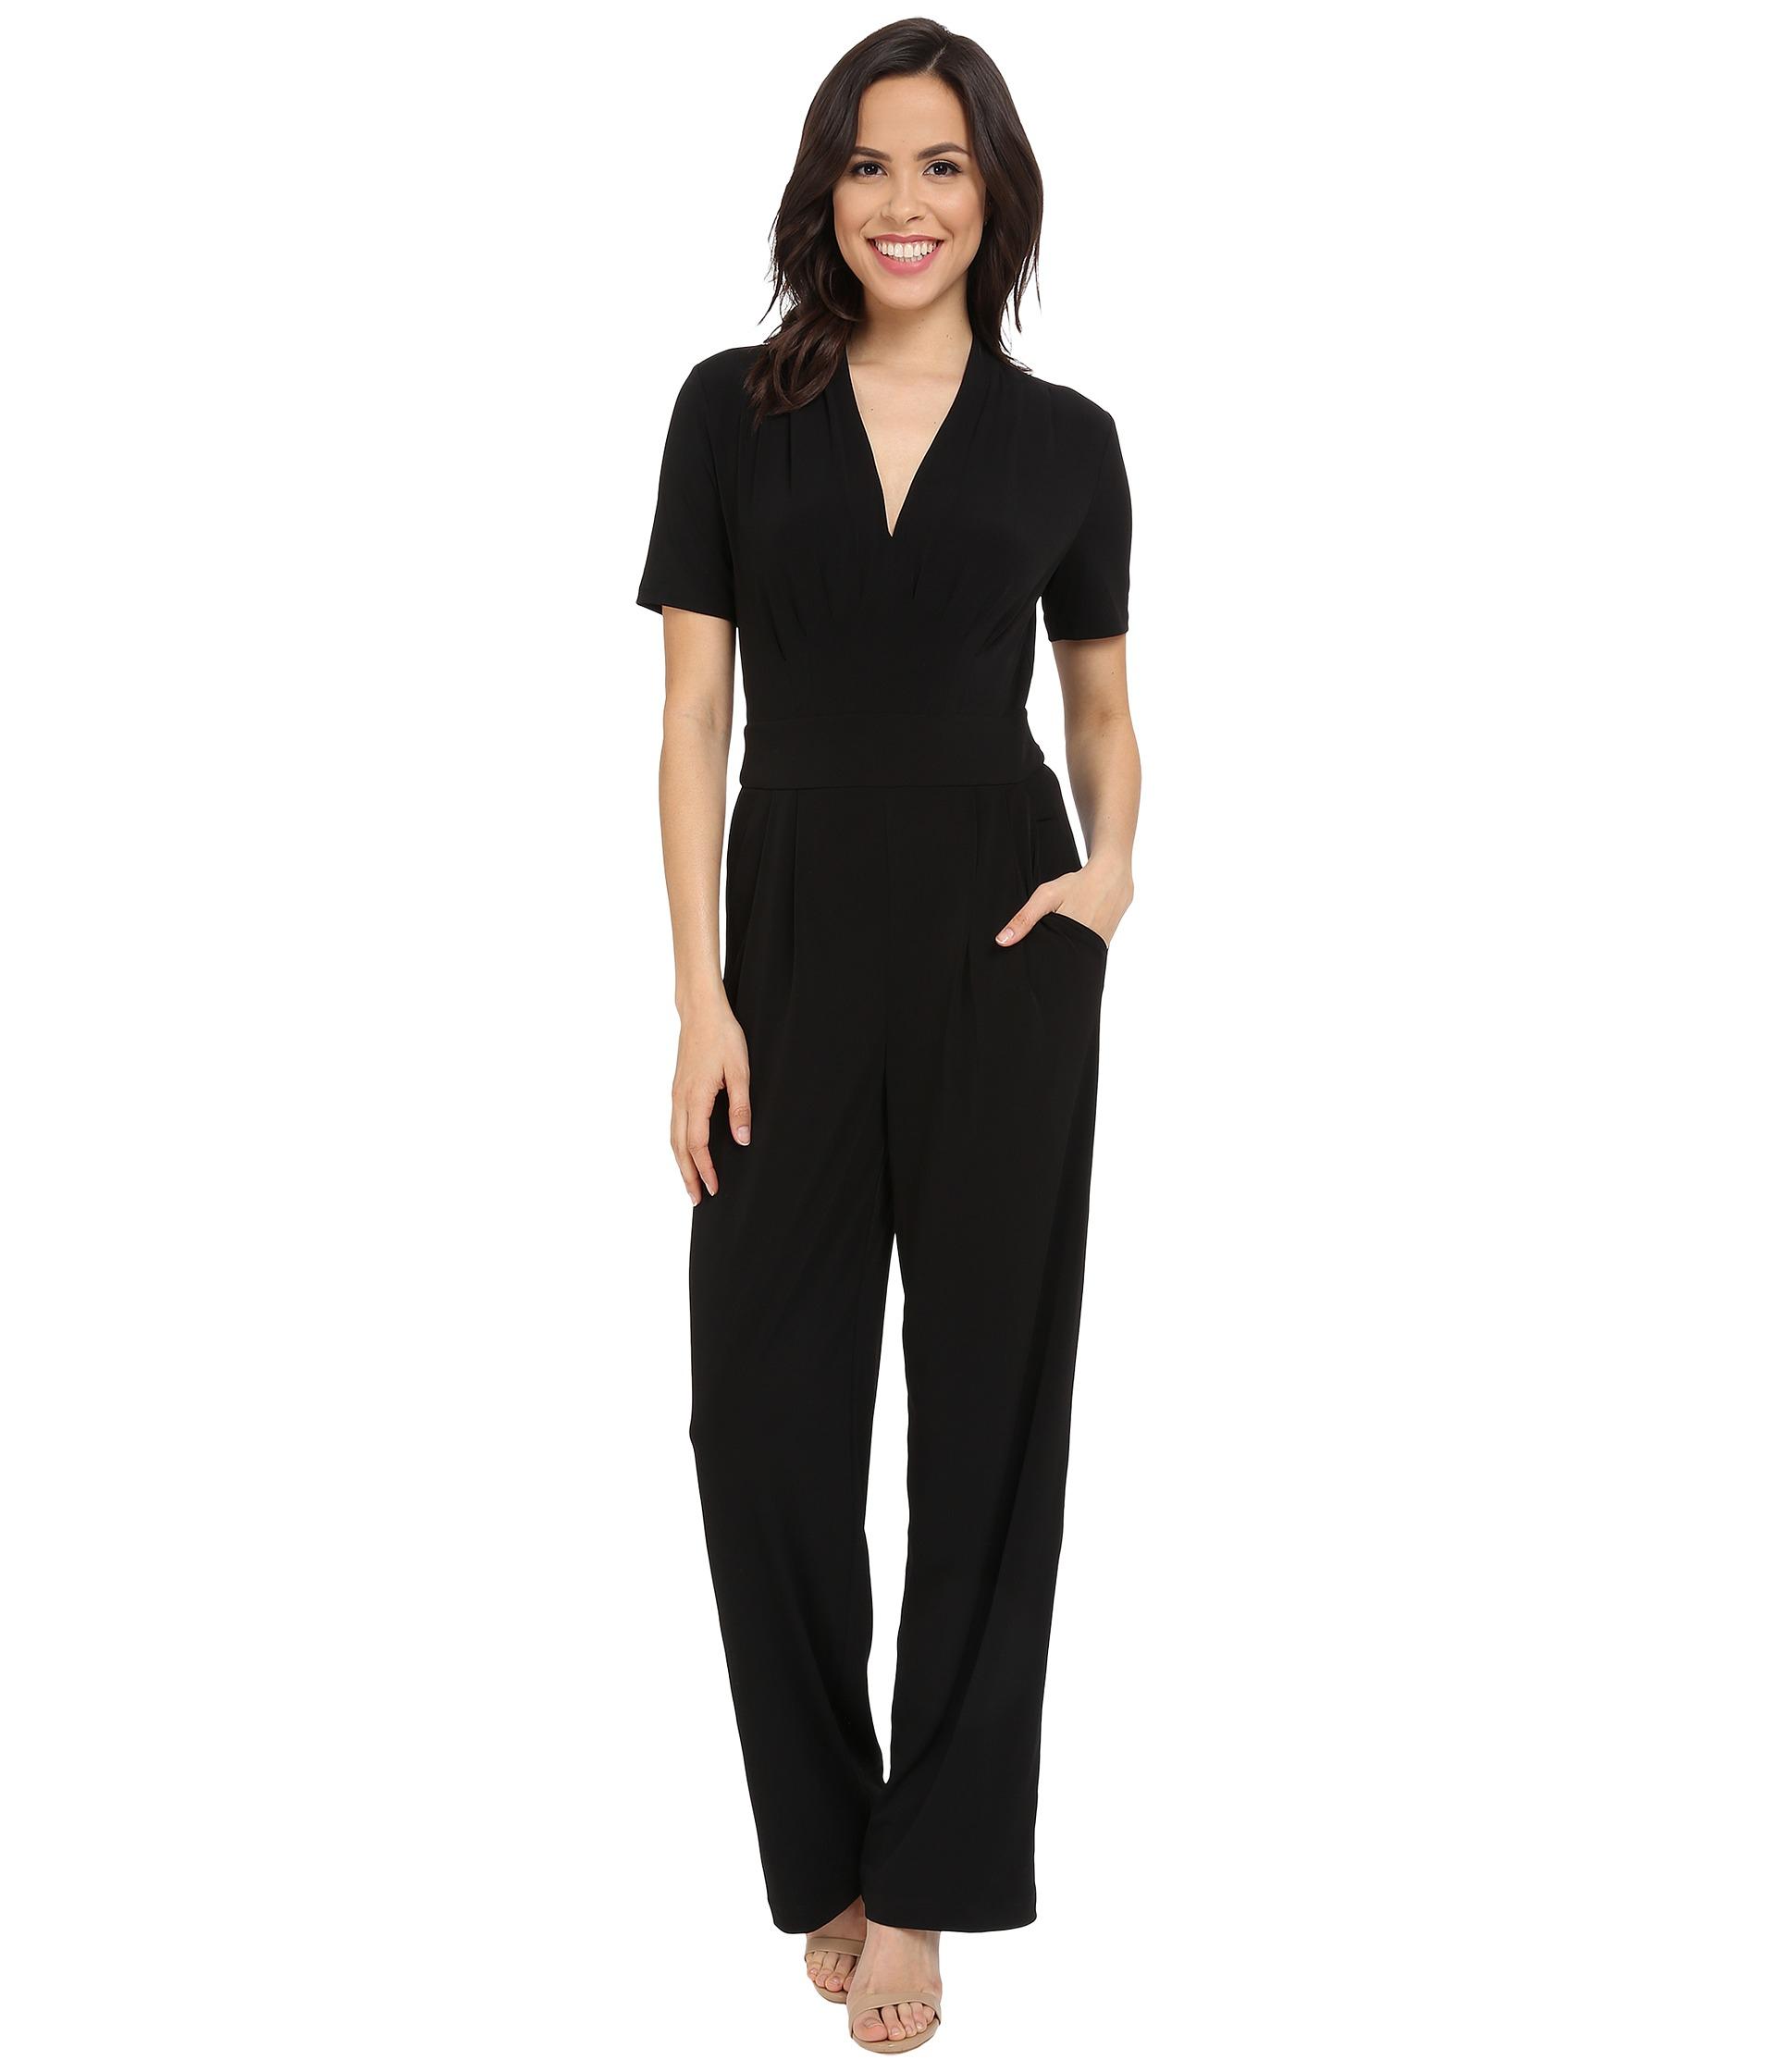 e22d9d751db0 Lyst - Catherine Malandrino Kylie Jumpsuit in Black